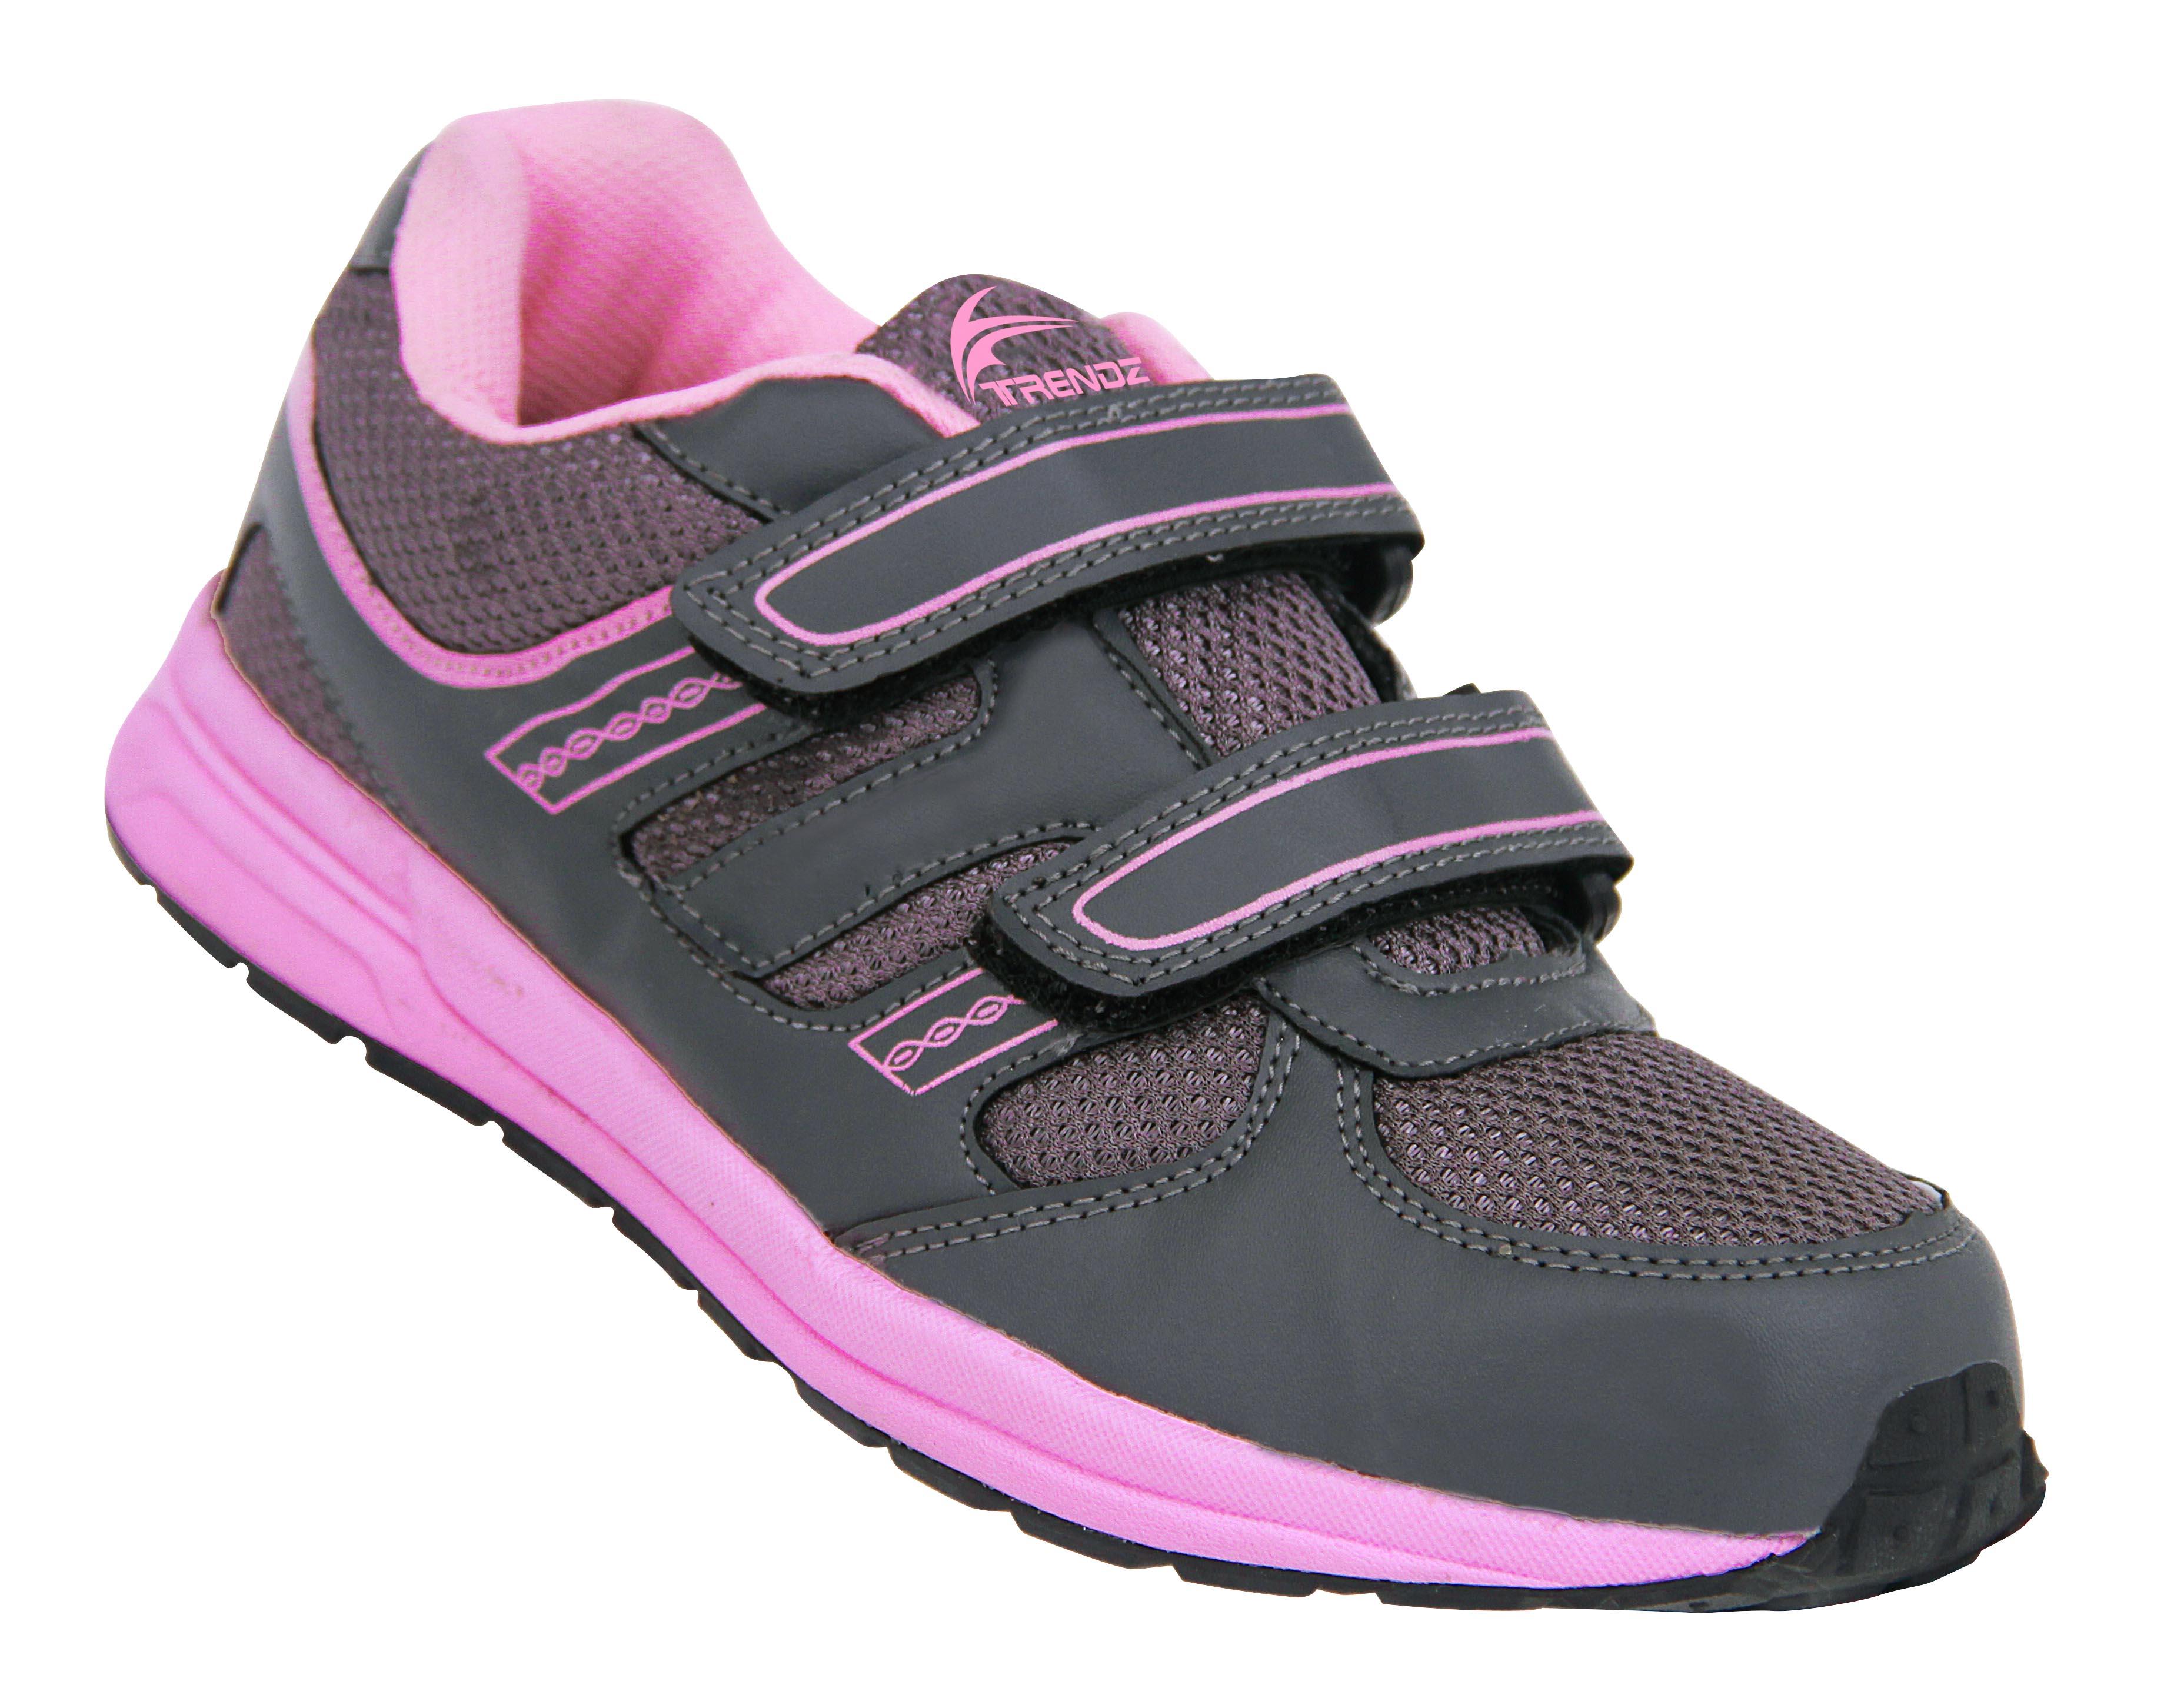 Trendz fashion Sports Running Shoes, MJ-913, Pink/Grey